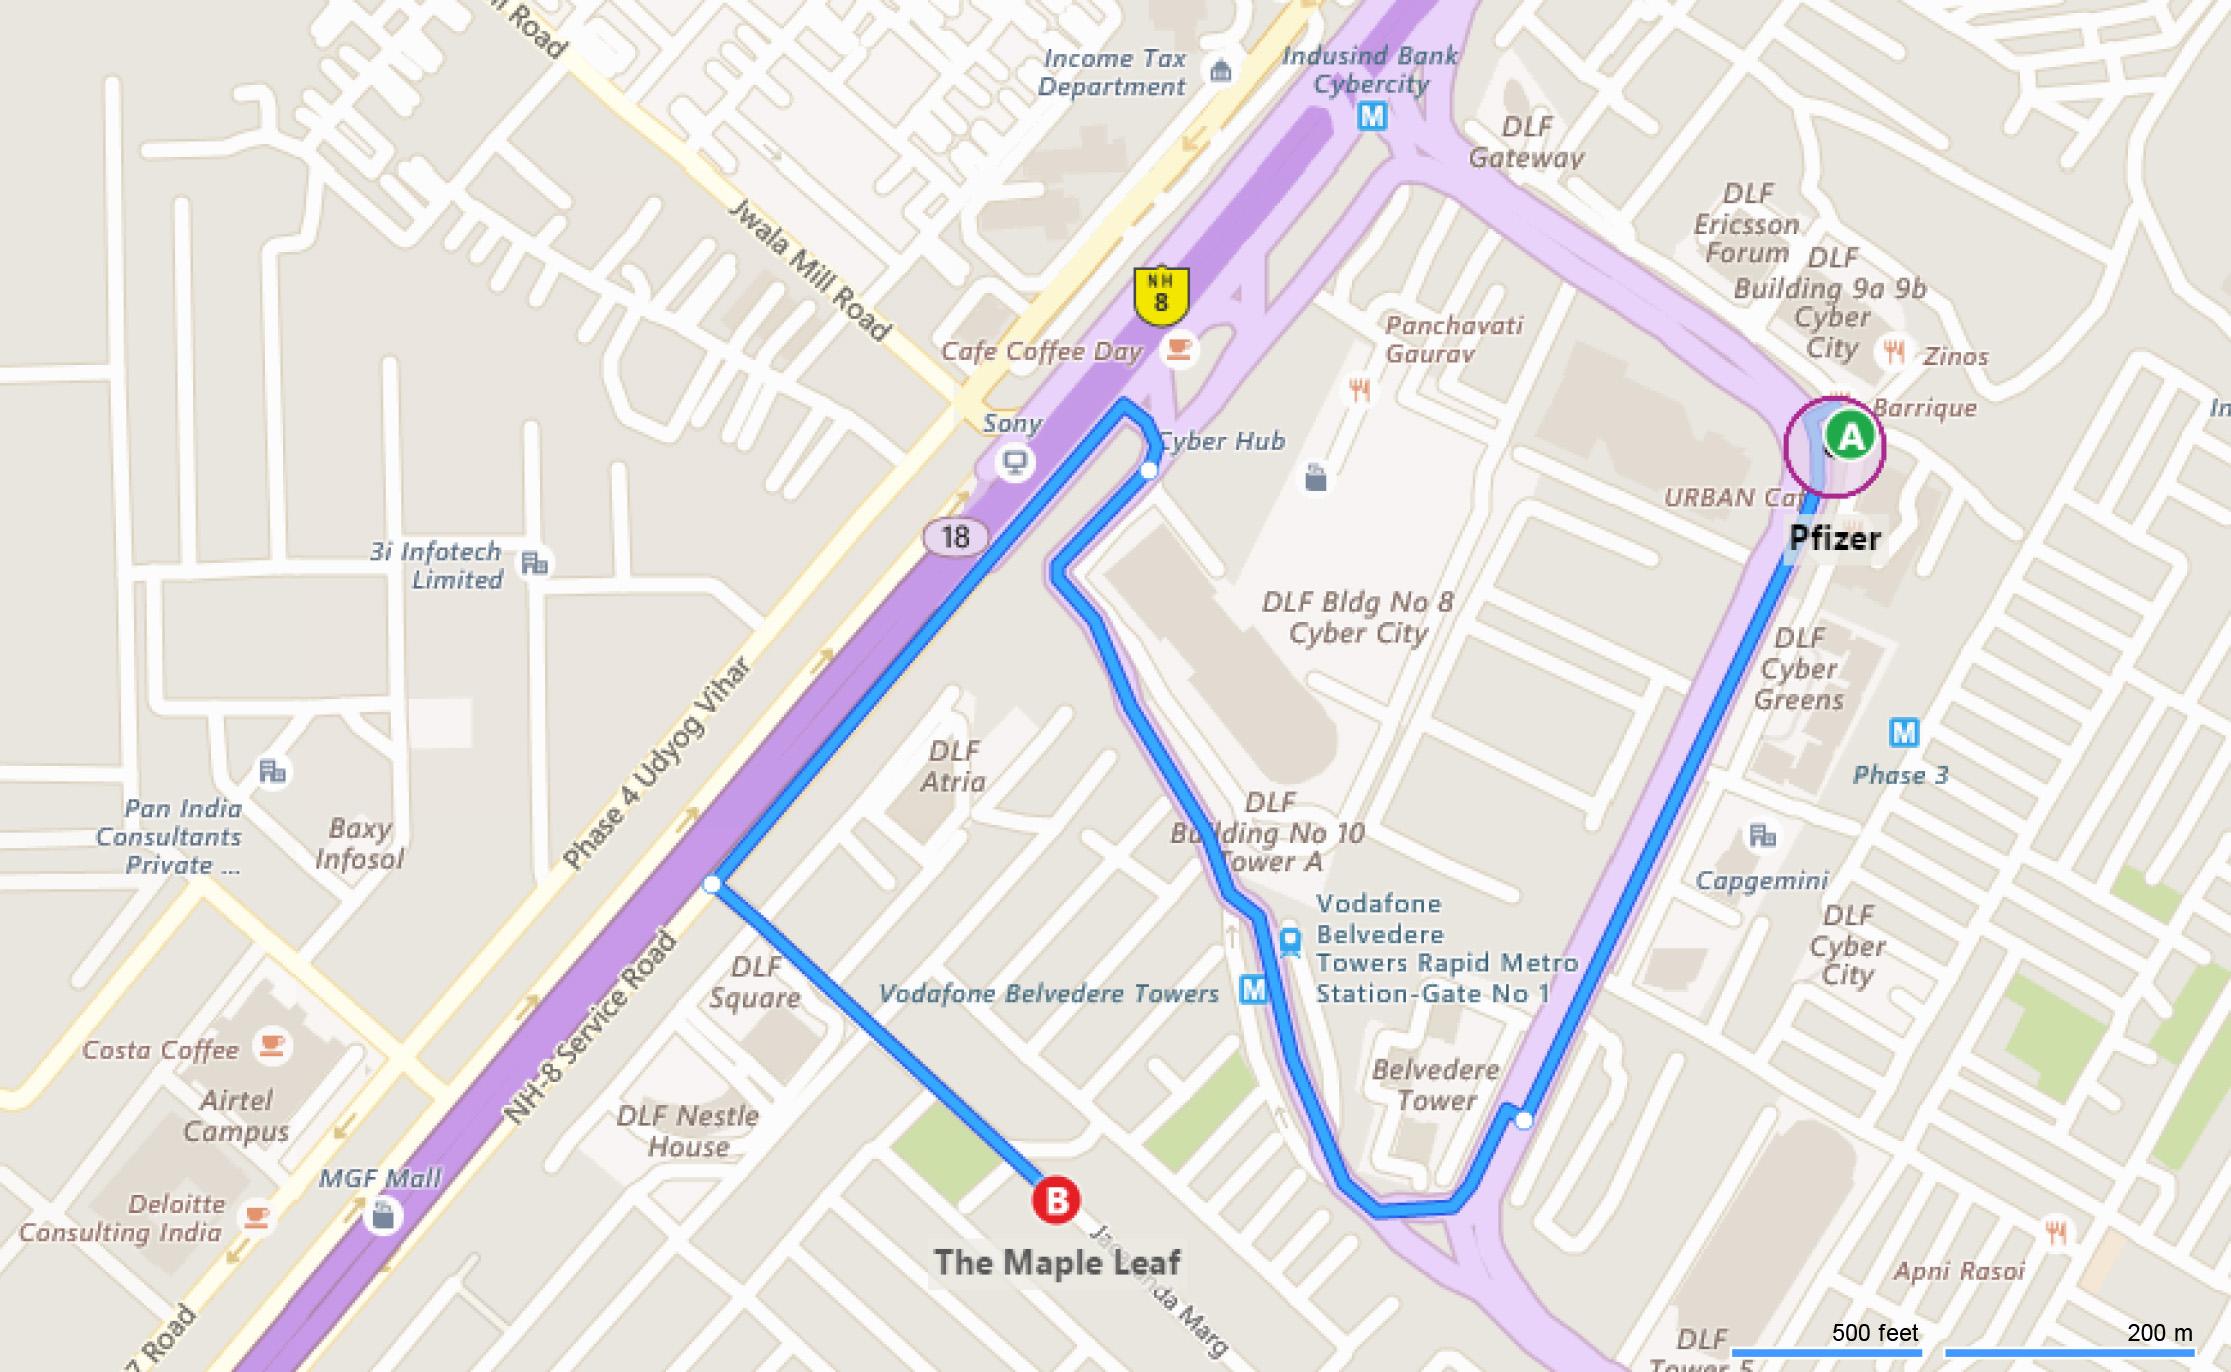 Budget Hotel Near Pfizer Office Gurgaon | Budget Hotels in